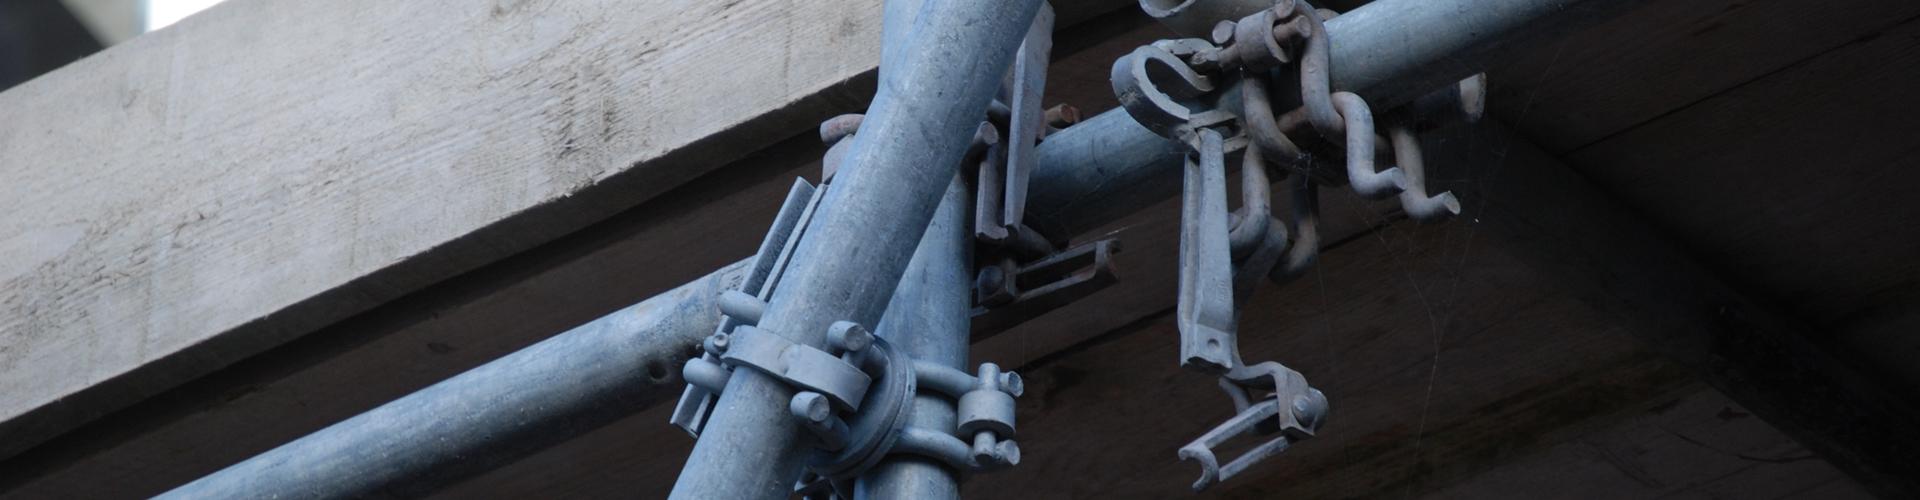 Constructo B.V. - Specialisten in steigerbouw.